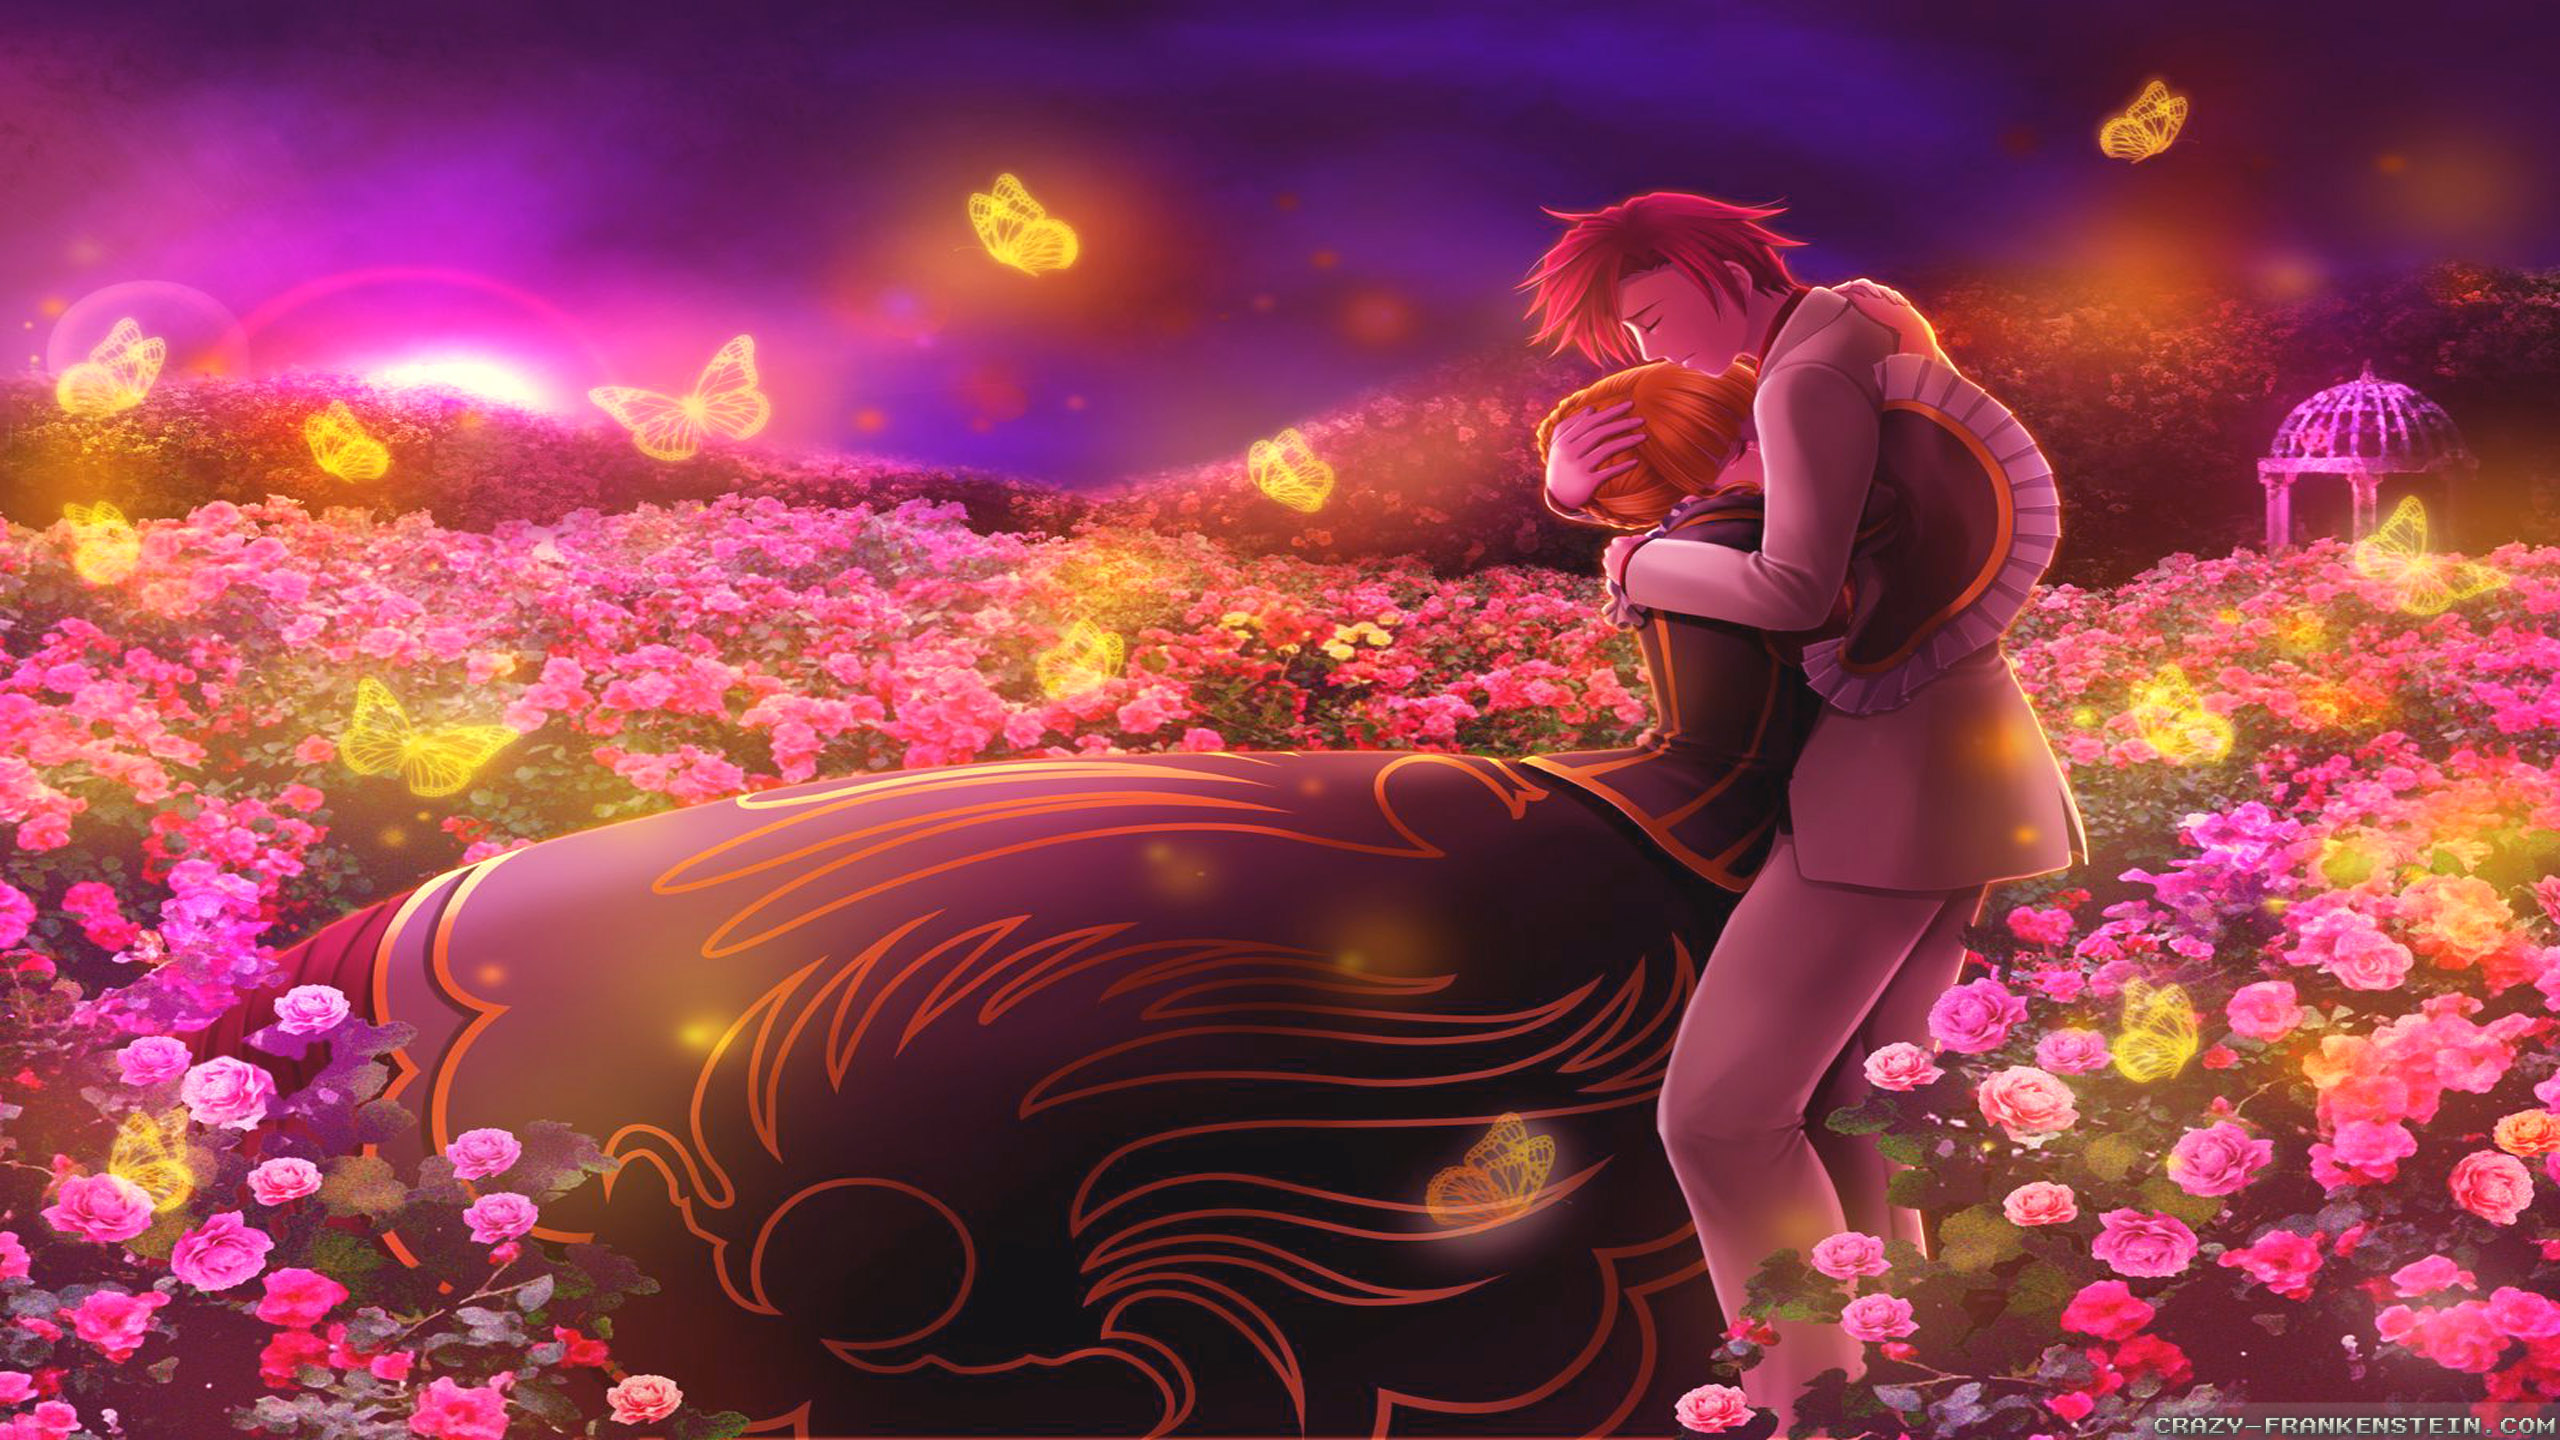 beautiful wallpapers,violet,purple,illustration,organism,love